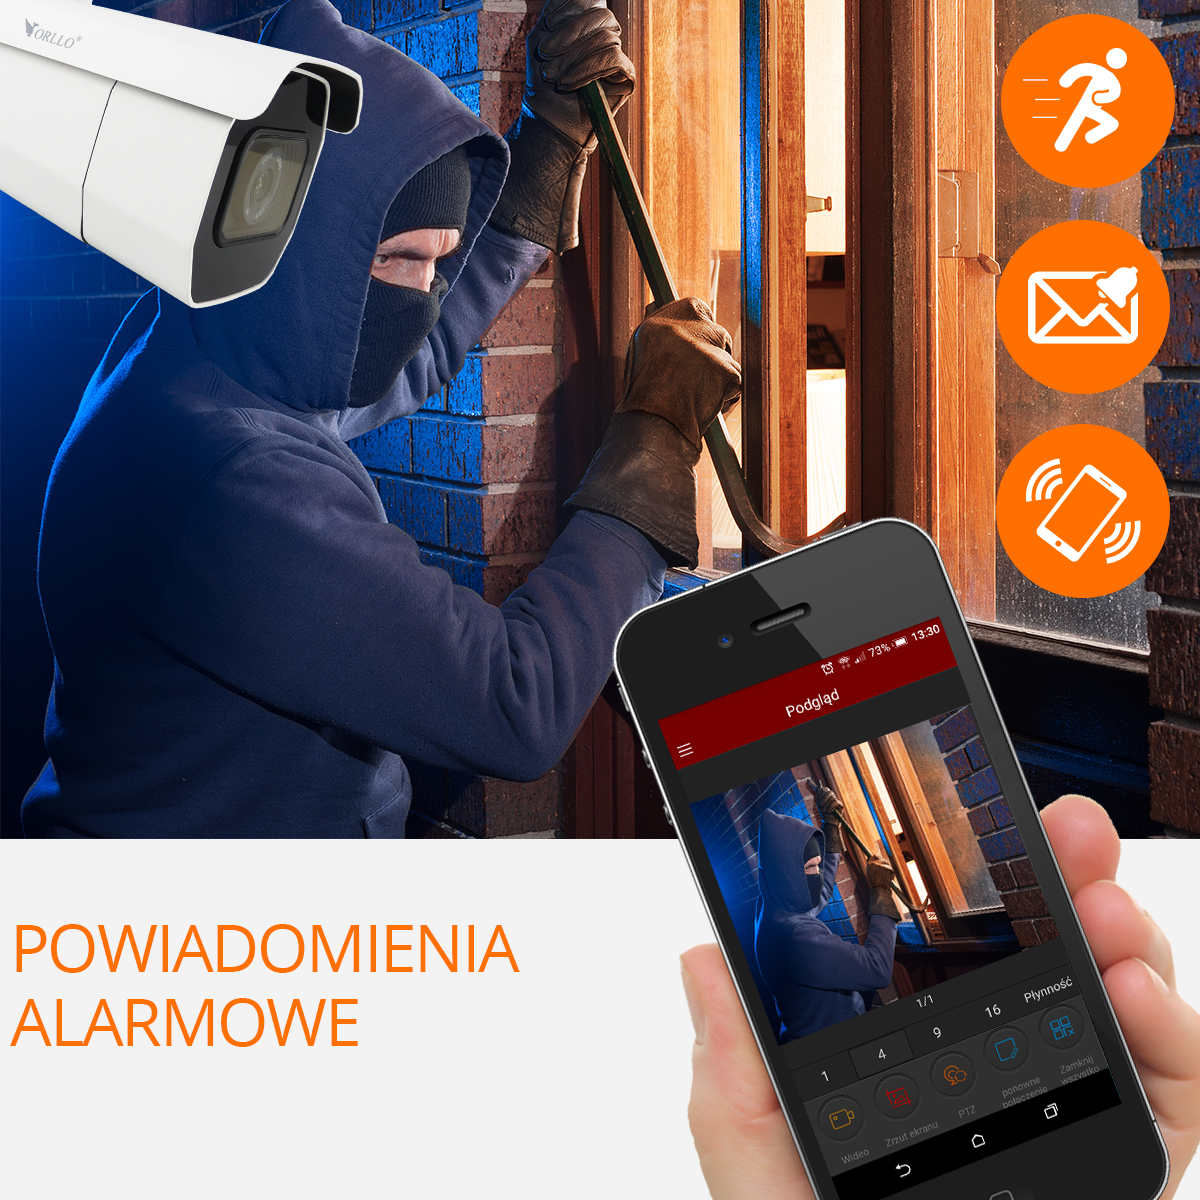 kamera z wykrywaniem ruchu alarm orllo.pl